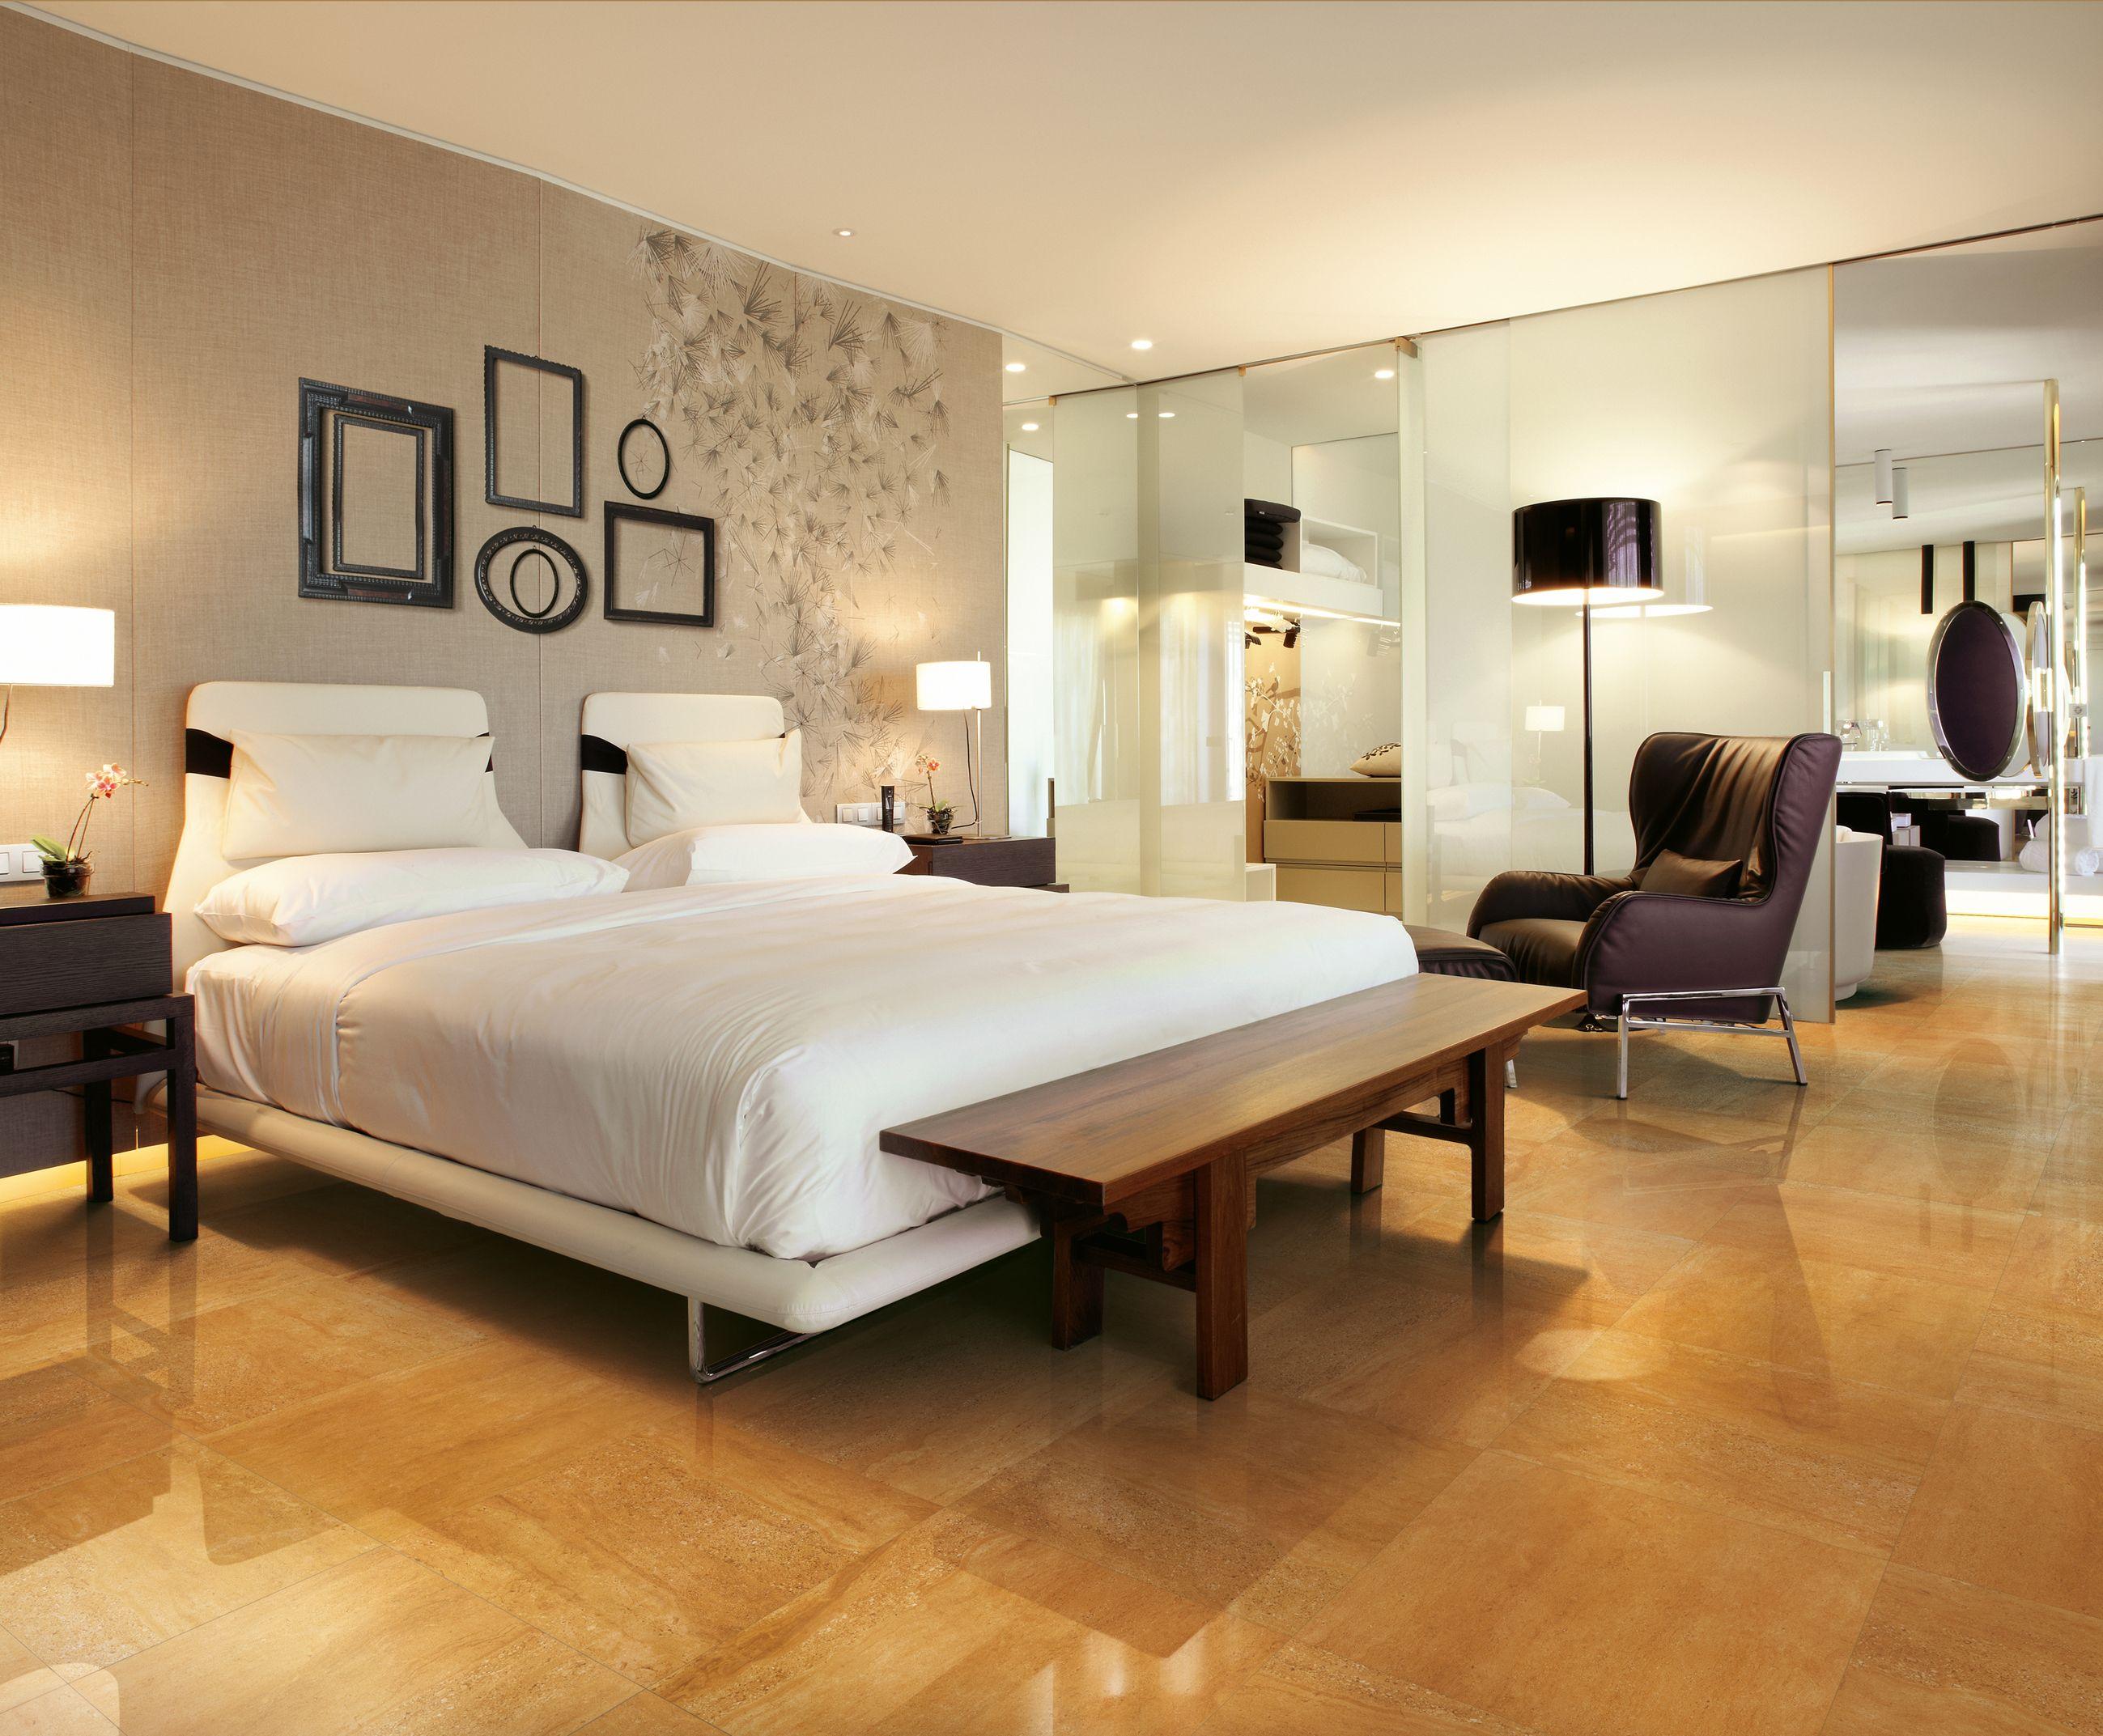 Tropical Tile Bedroom Tile Tile Bedroom Bedroom Flooring Bedroom Colors